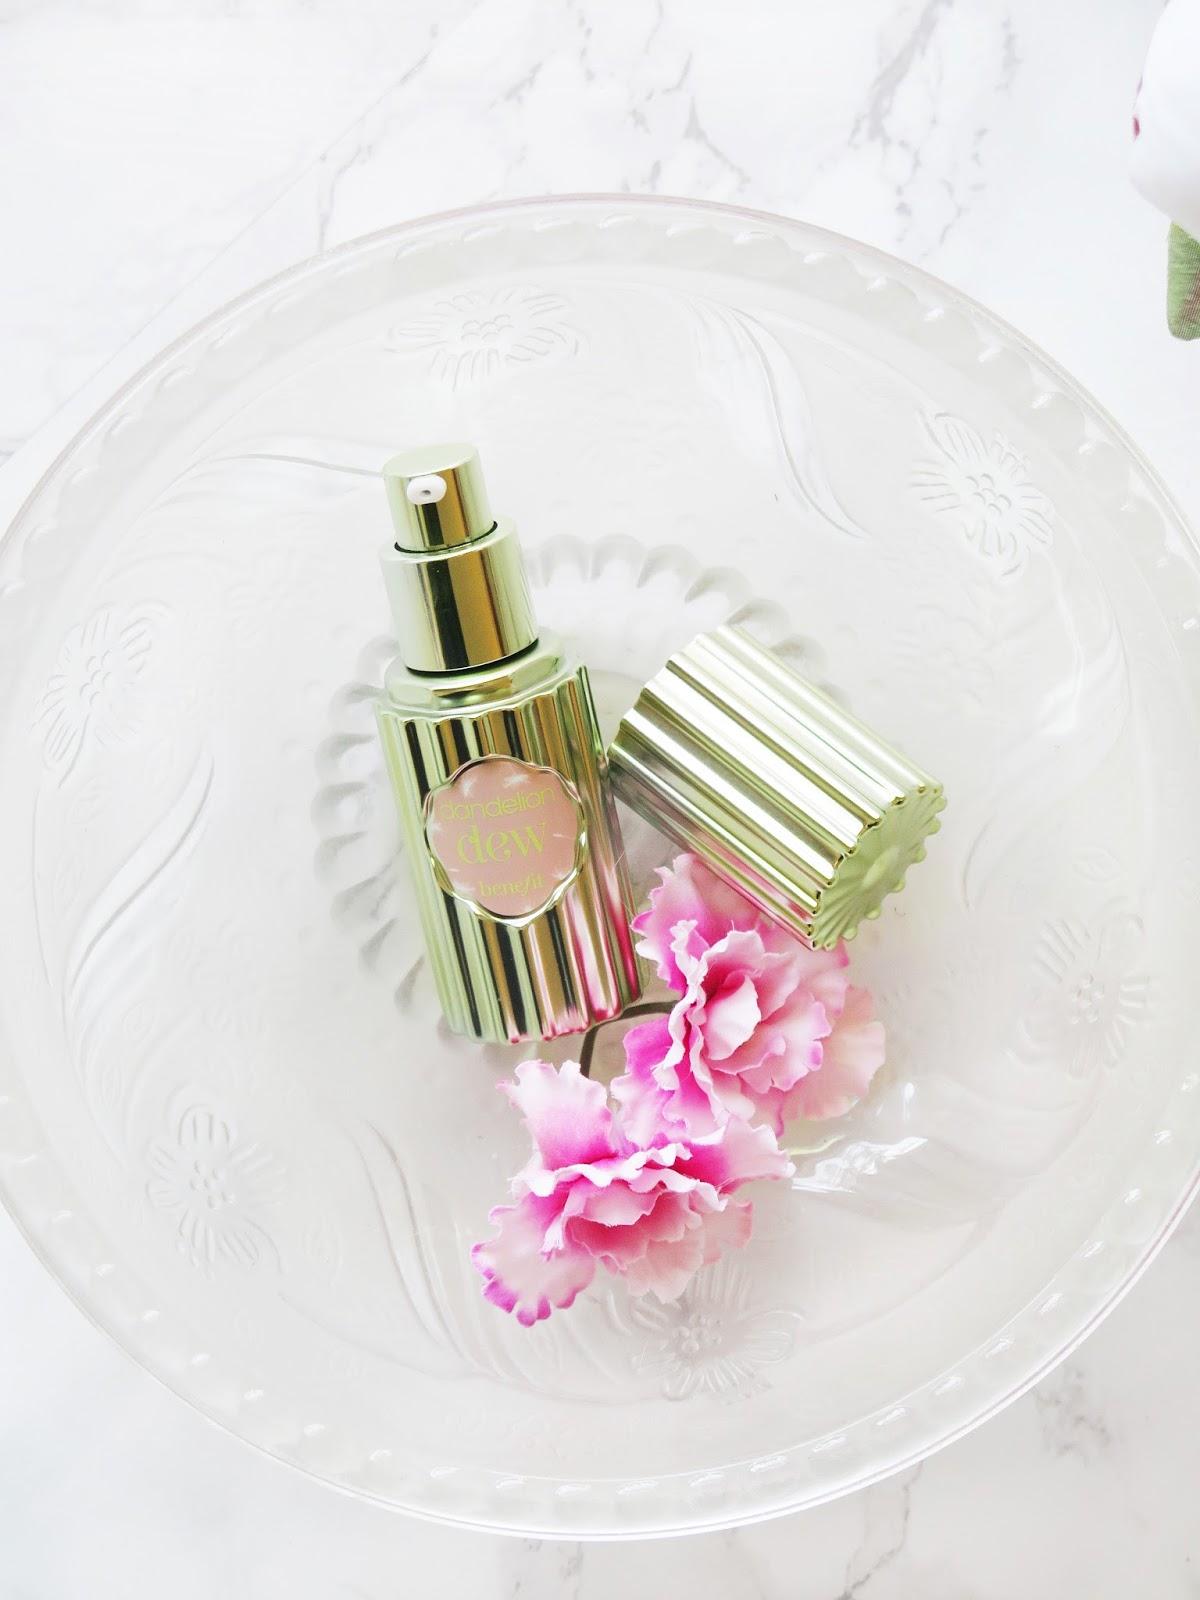 Dandelion Dreams | Benefit Cosmetics Dandelion Dew & Shy Beam | Review & Swatches | labellesirene.ca